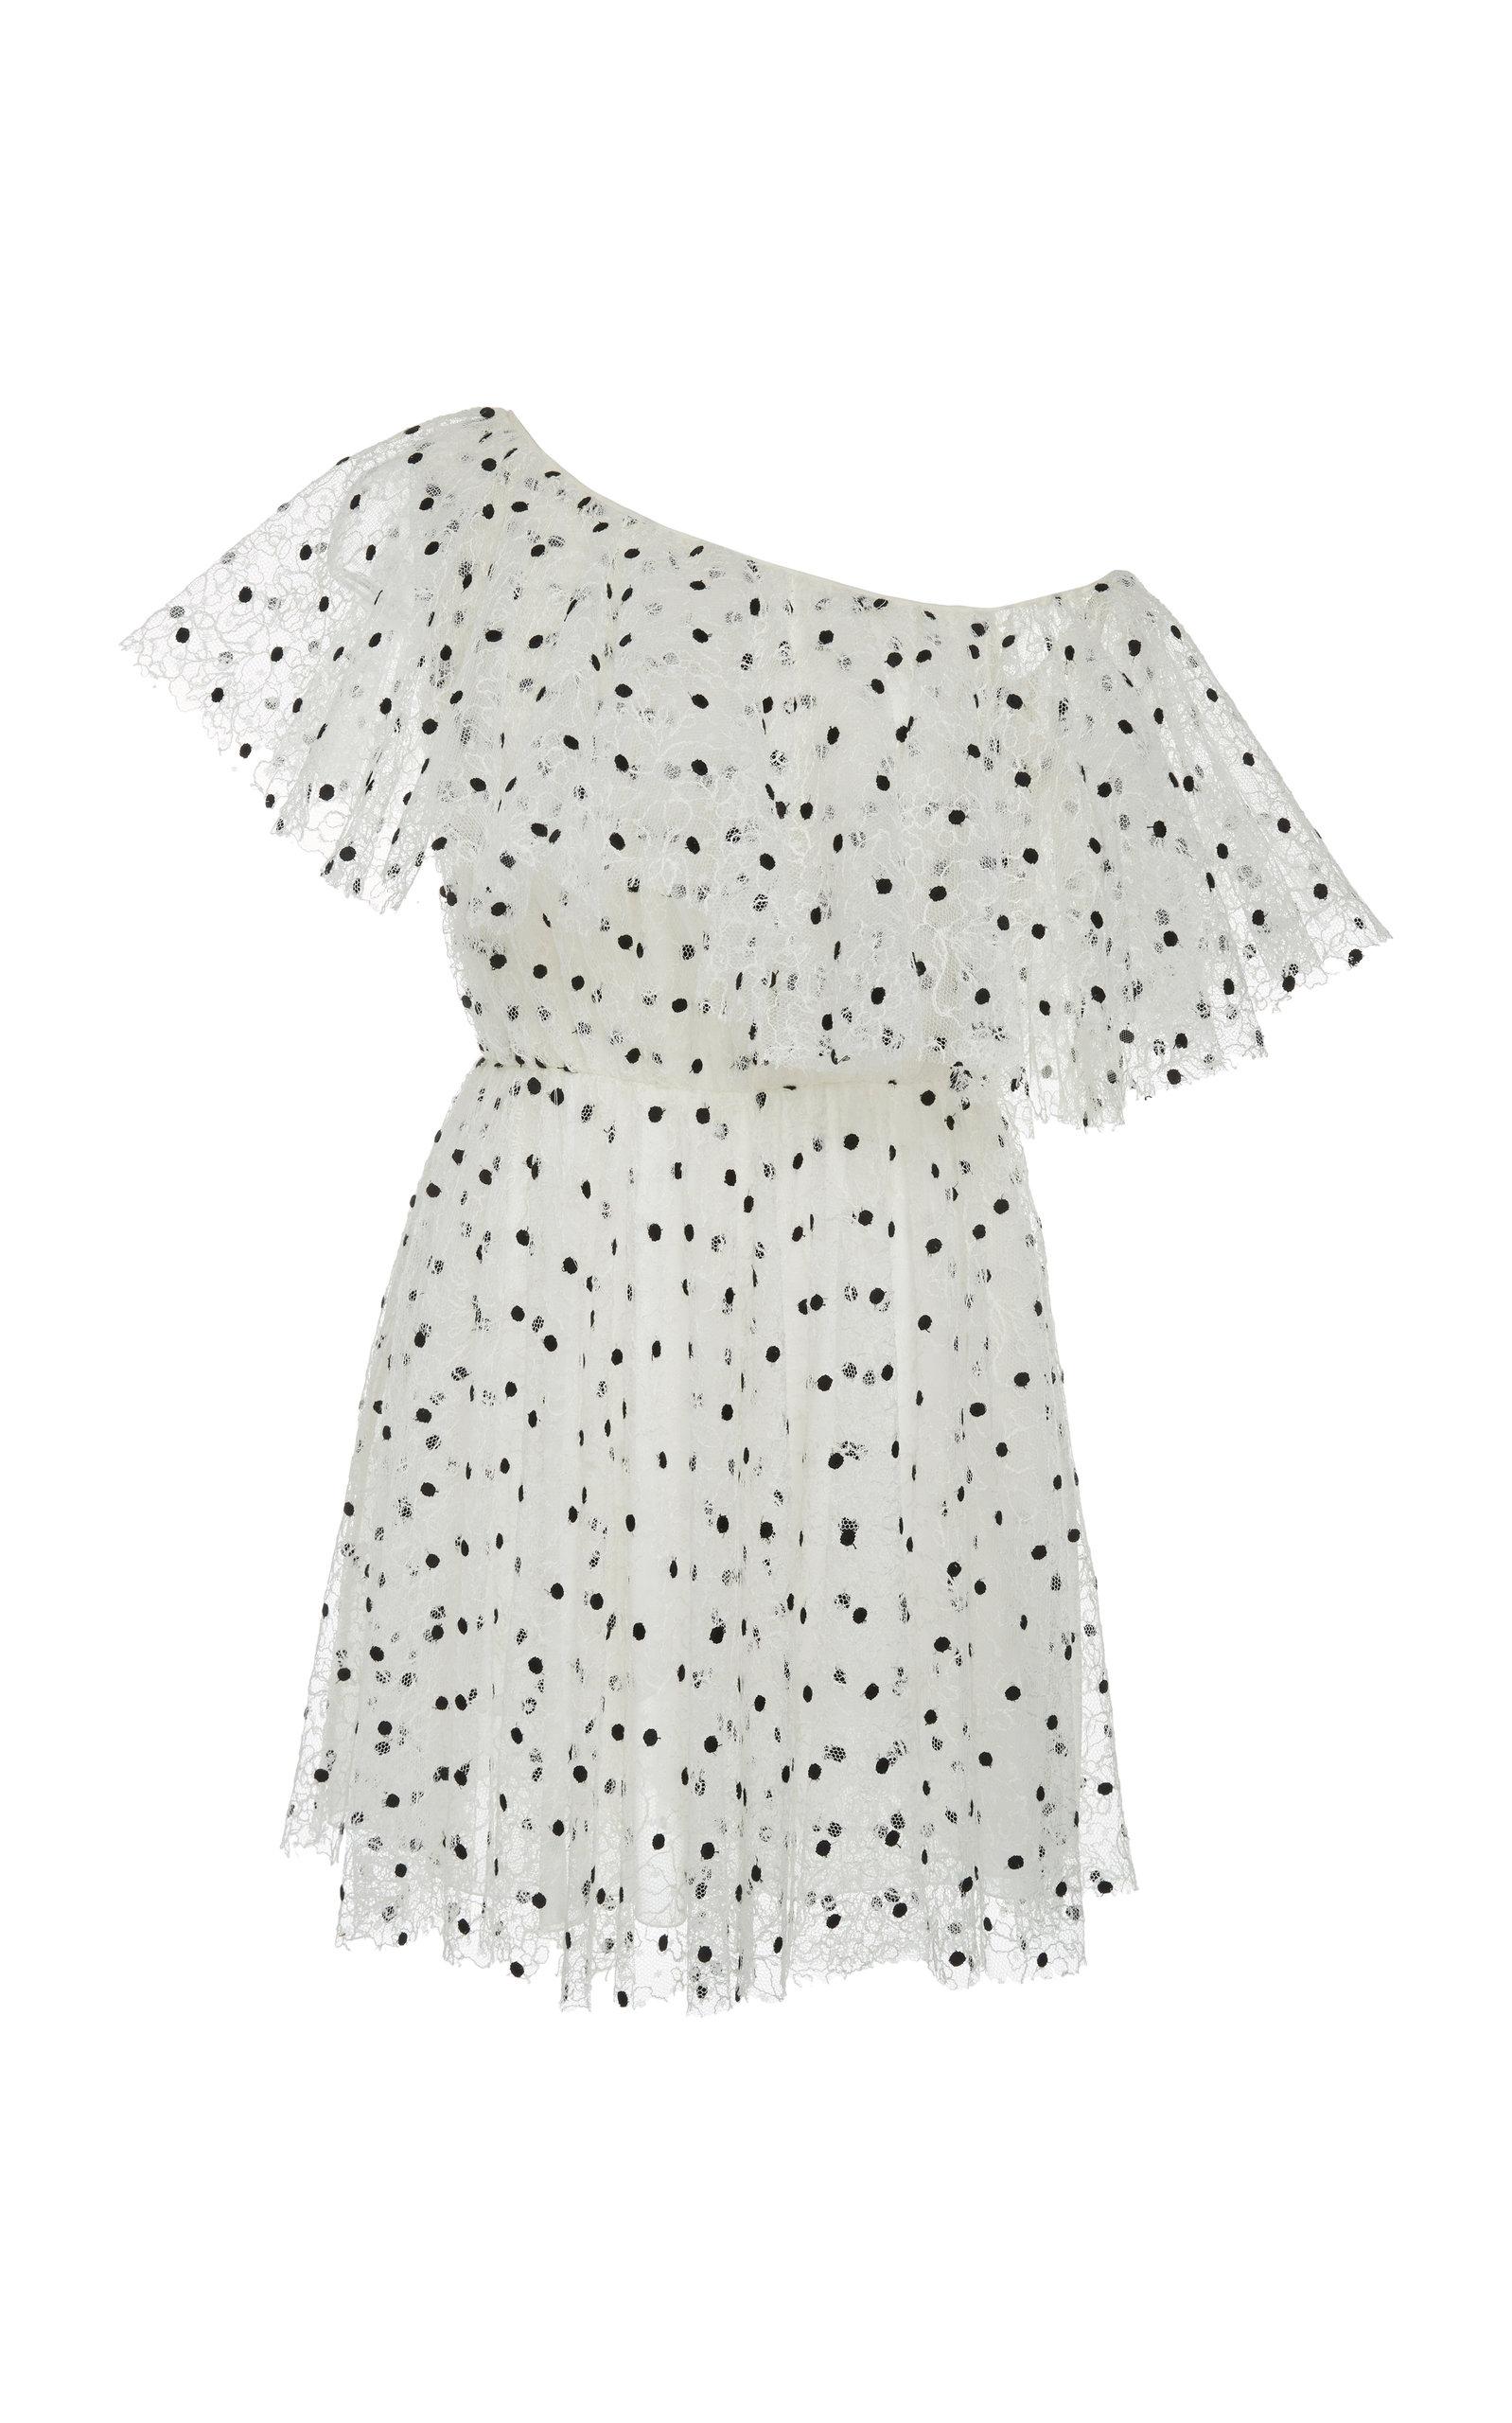 Buy Giambattista Valli Polka-Dot Off-The-Shoulder Tulle Mini Dress online, shop Giambattista Valli at the best price